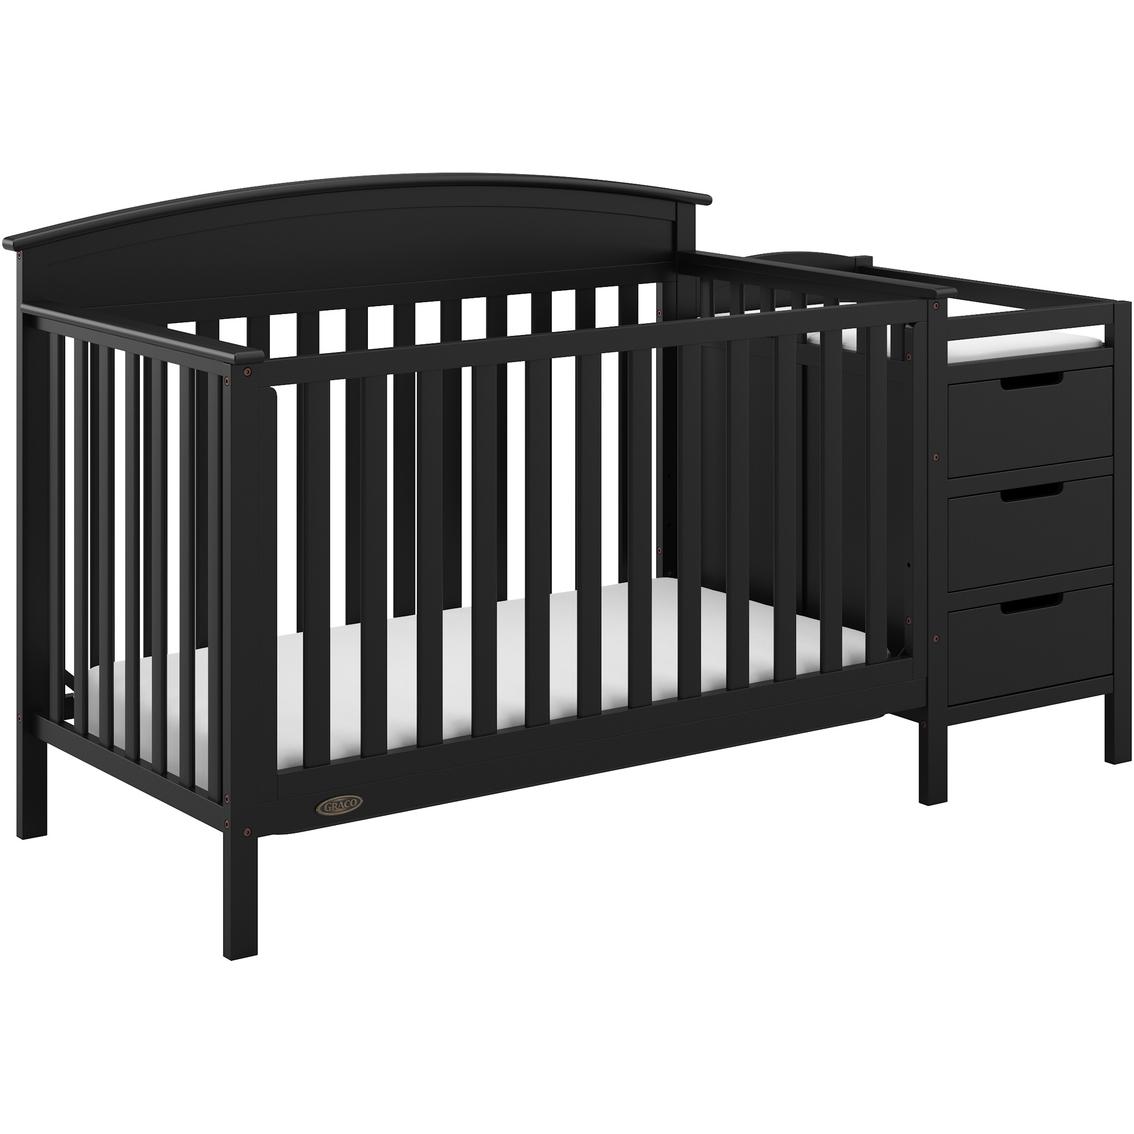 Graco Benton 4 In 1 Convertible Crib And Changer Cribs Baby Toys Shop The Exchange